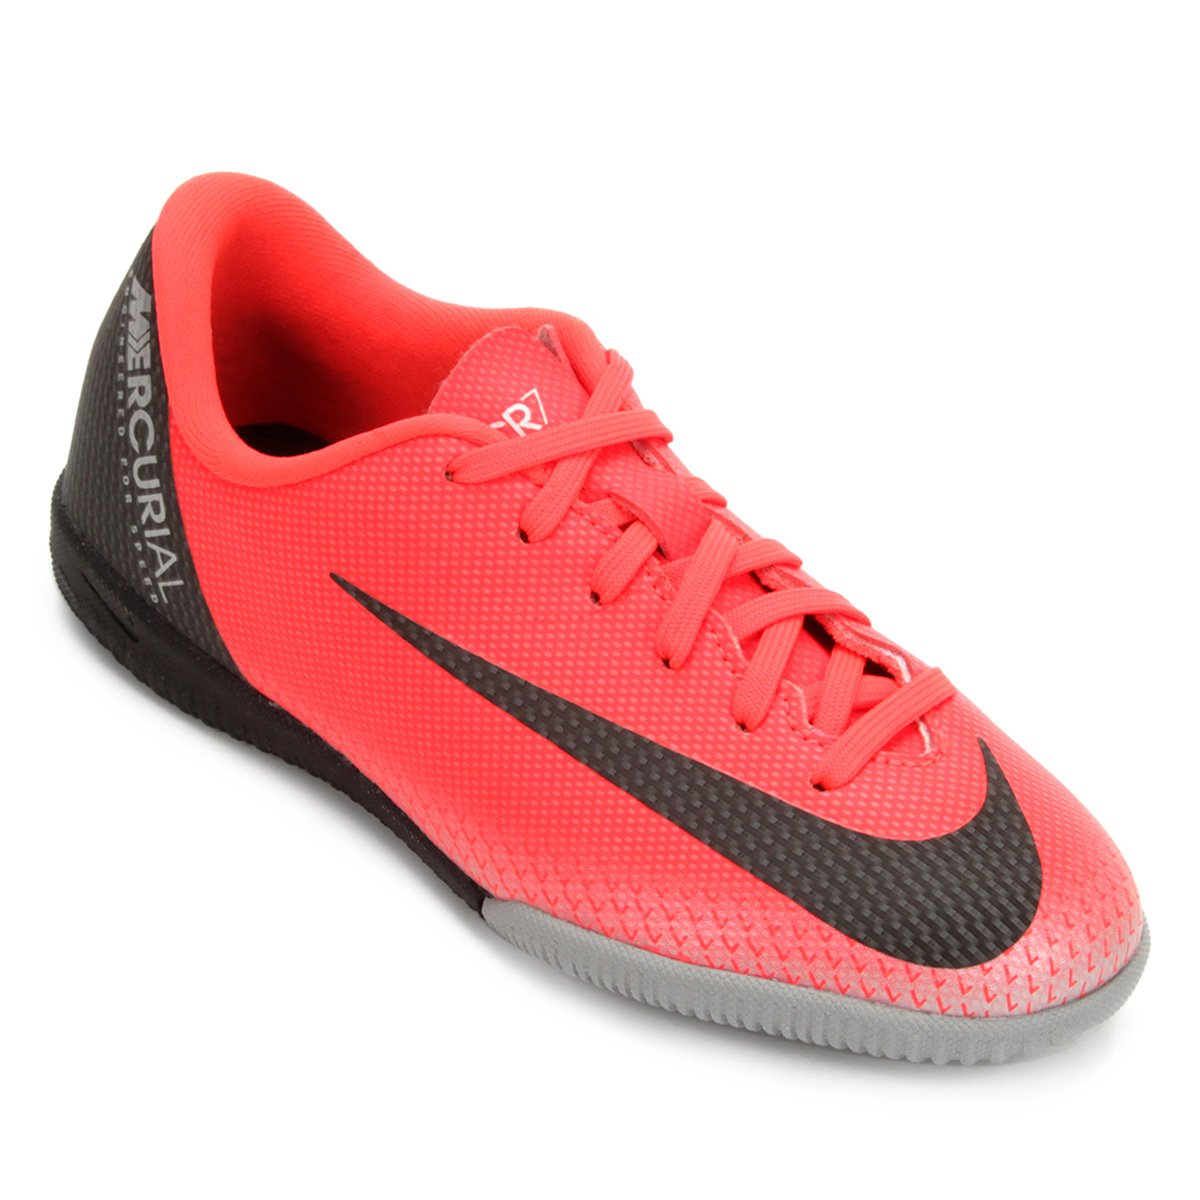 2c4cd8435a Chuteira Futsal Infantil Nike Vapor 12 Academy GS CR7 IC - Vermelho ...